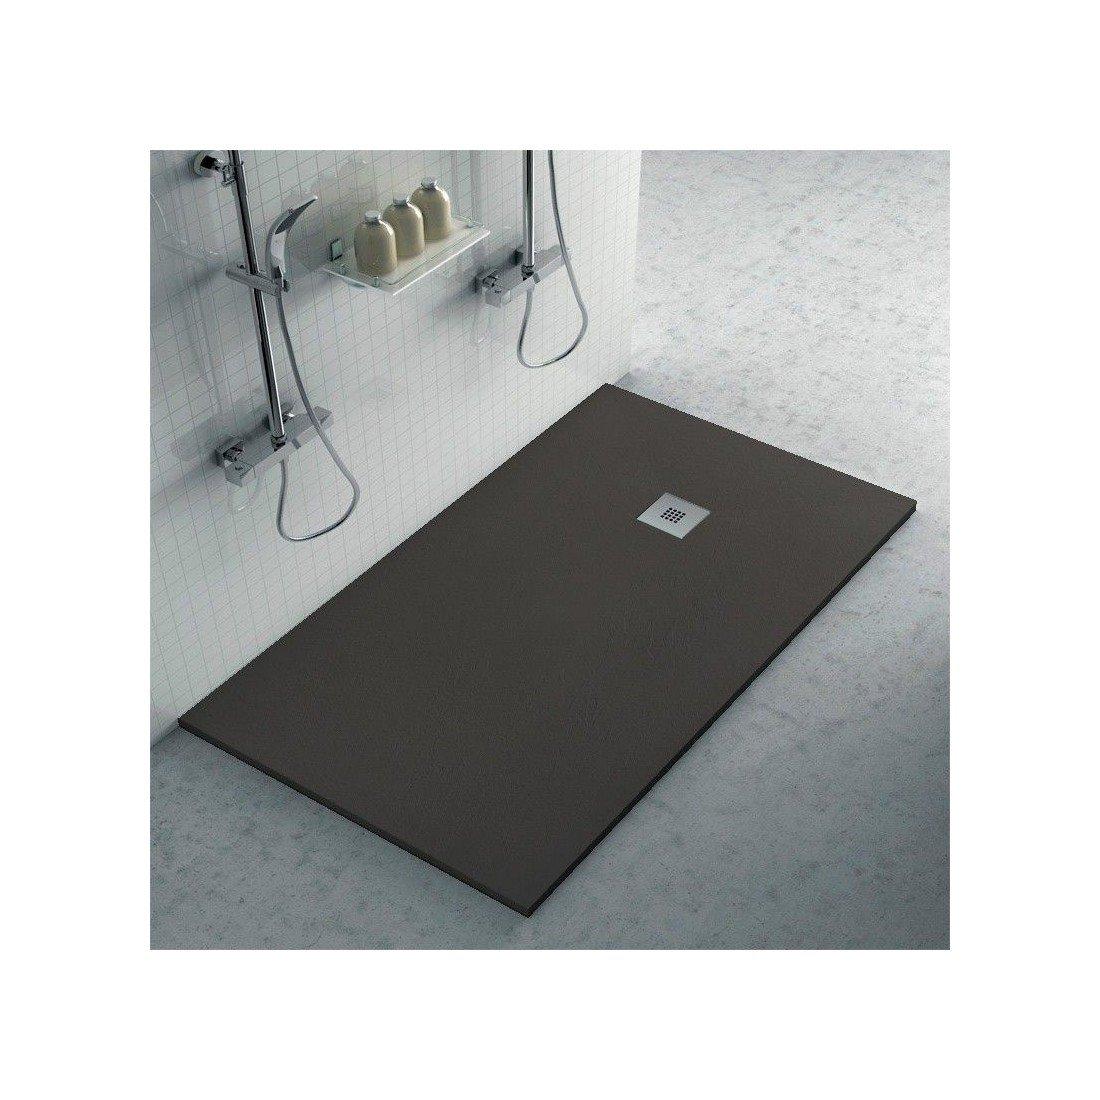 Comprar plato de resina pizarra antracita barato online - Plato de ducha negro ...